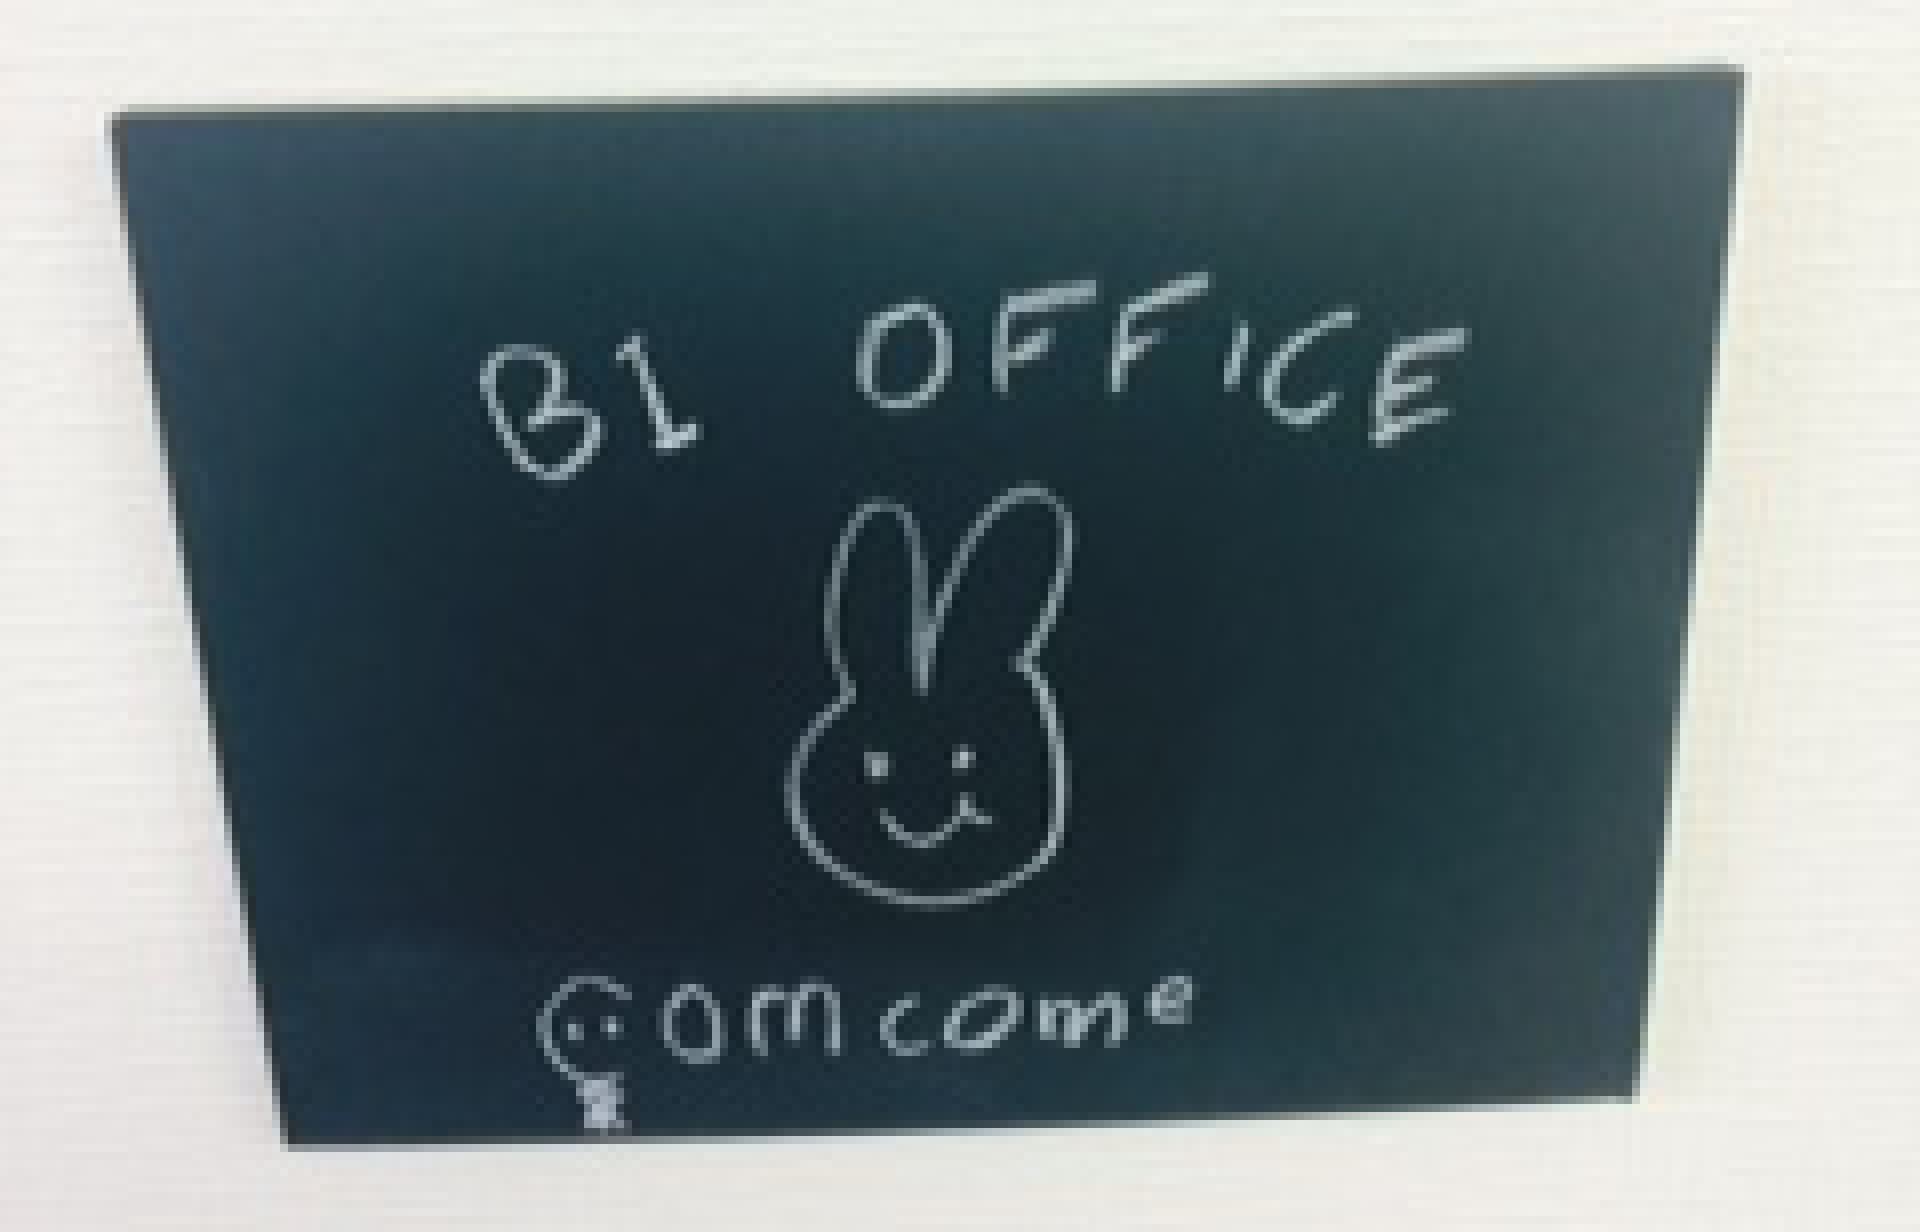 BIオフィス